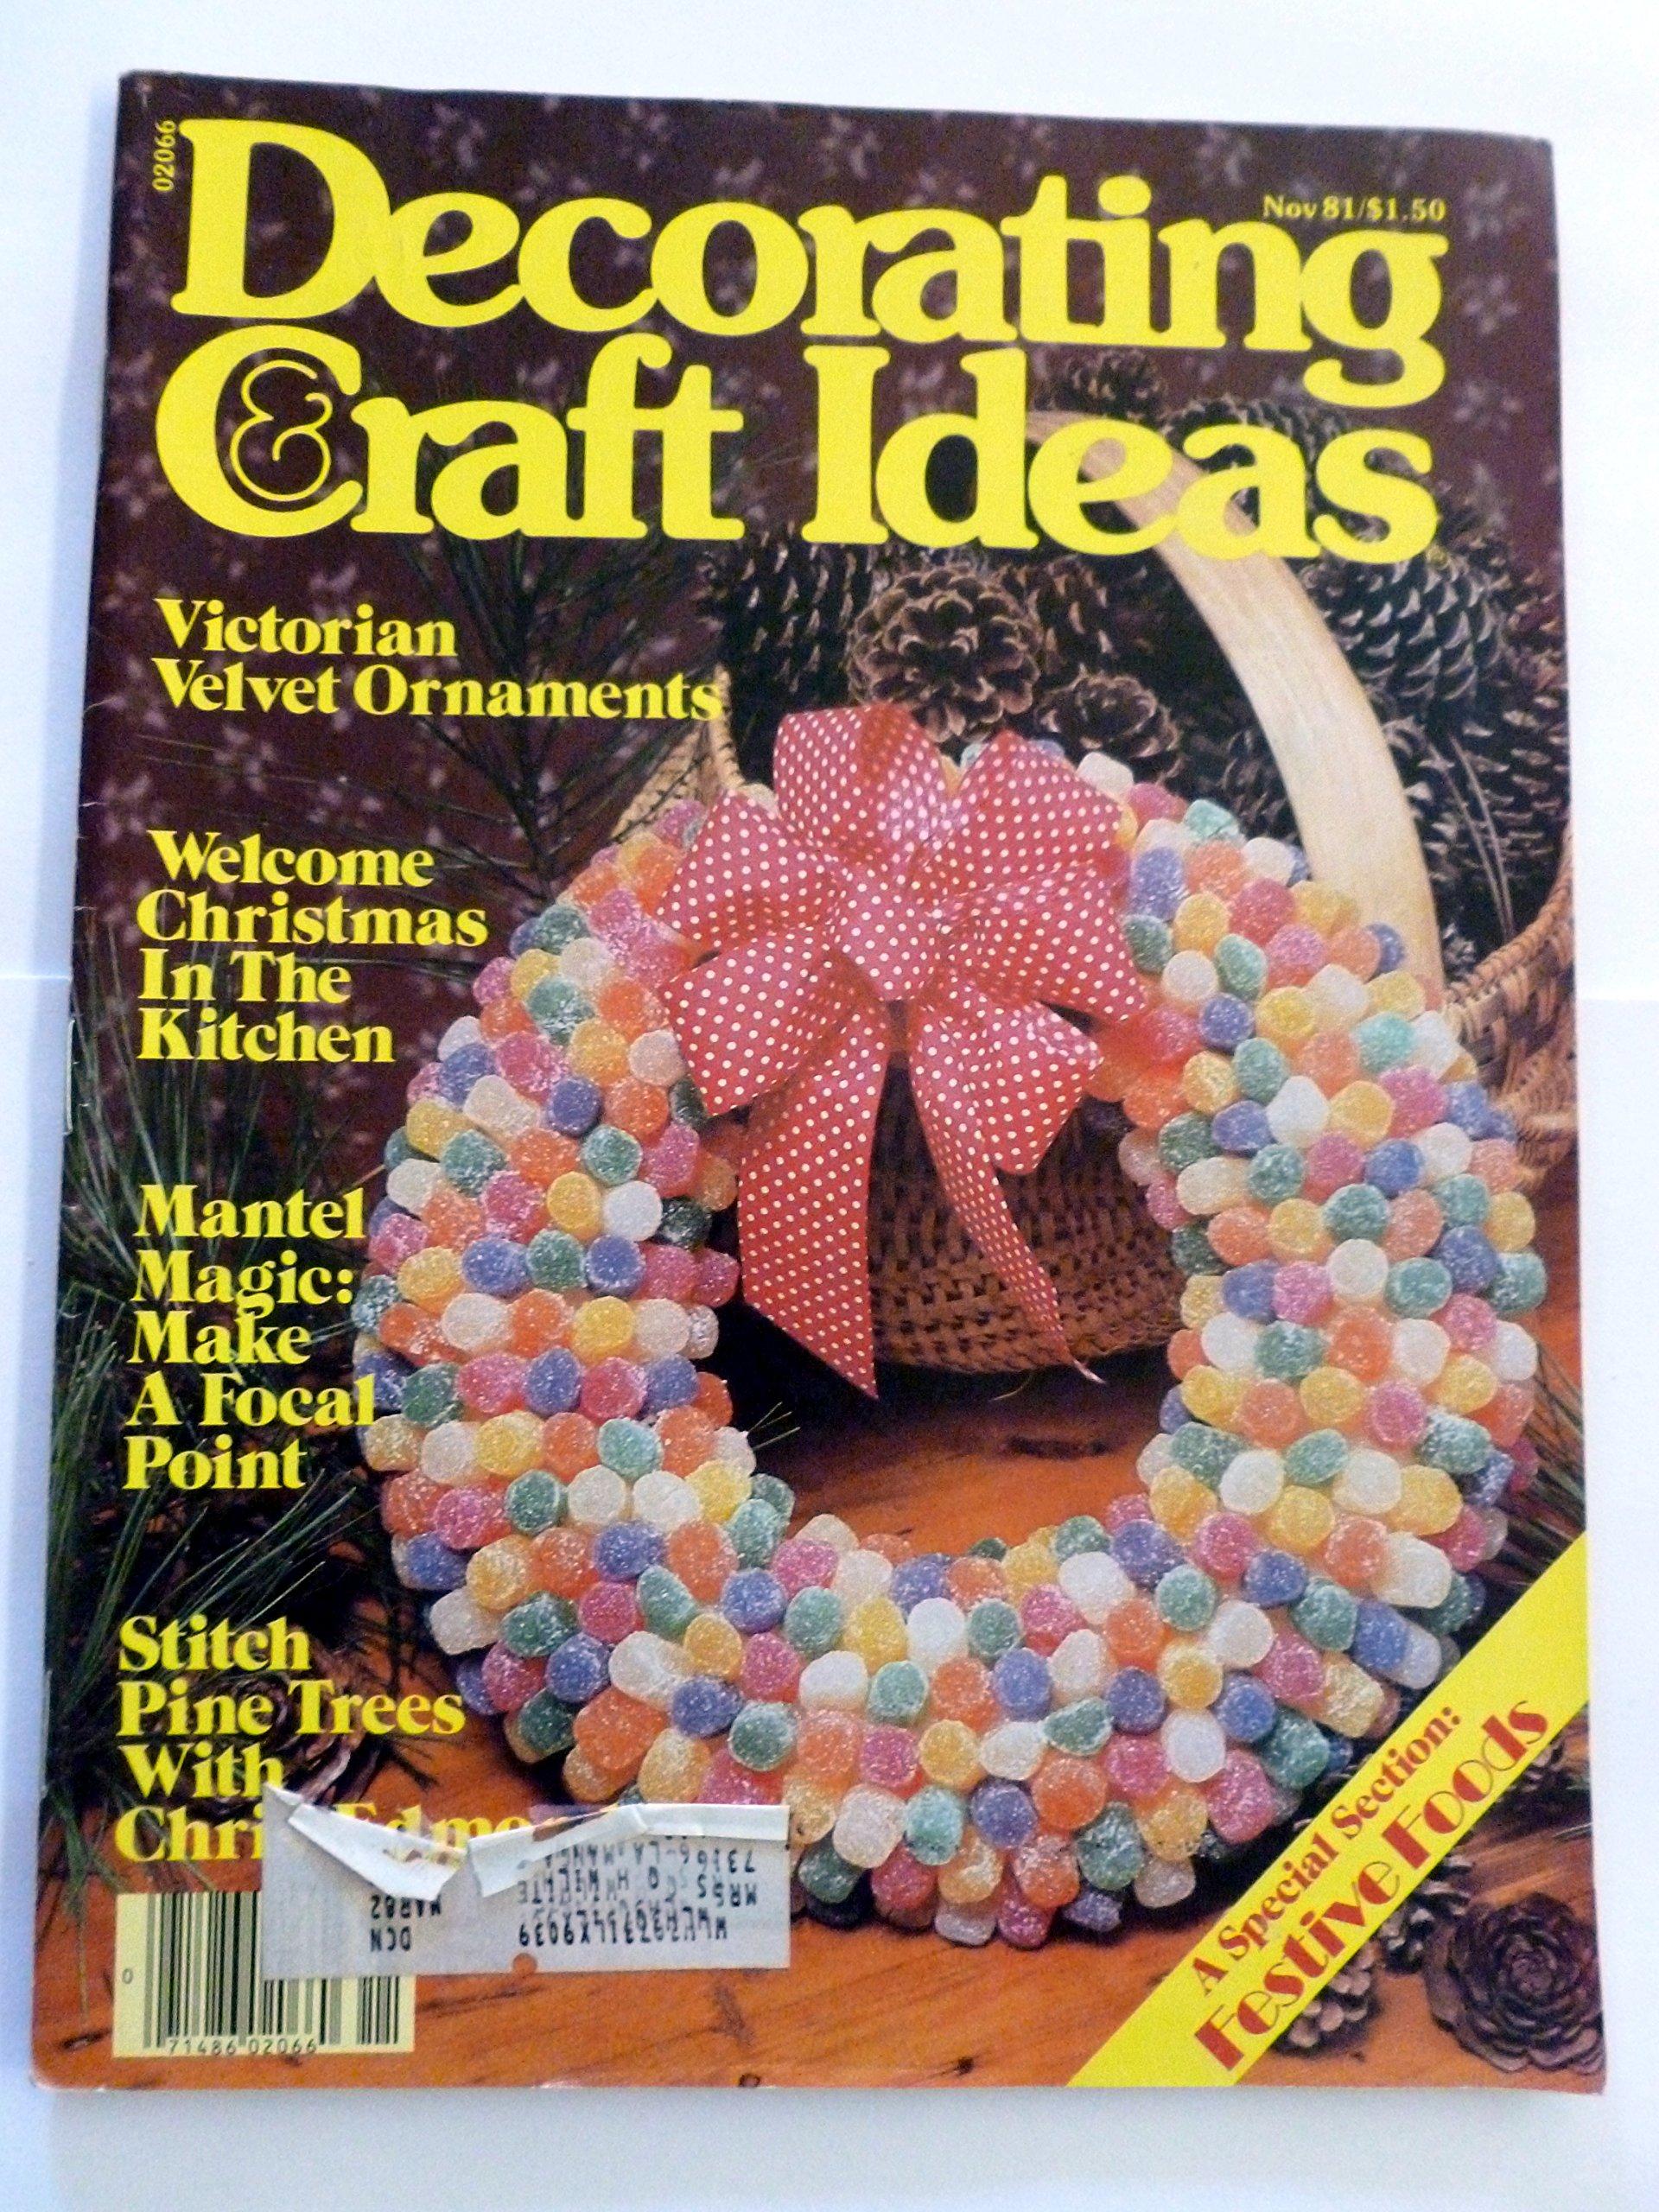 Decorating Craft Ideas November 1981 Volume 12 No 9 Mary